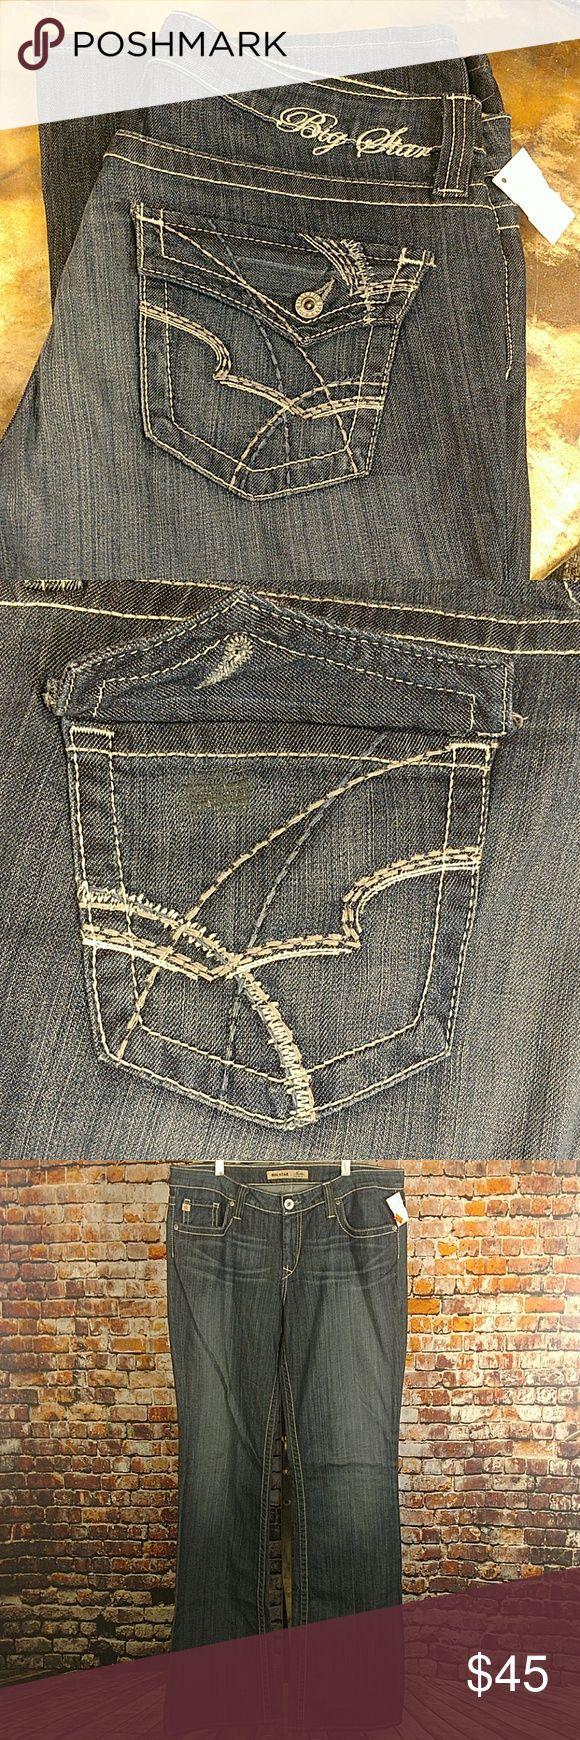 "NWT Big Star Denim Jeans 34 XXL New with tags Big Star denim jeans with embroidered pockets. Sold as irregulars, missing one back pocket button.  36"" waist, 10"" rise, 38"" inseam. Maddie Mid Rise Fit Big Star Jeans Boot Cut"